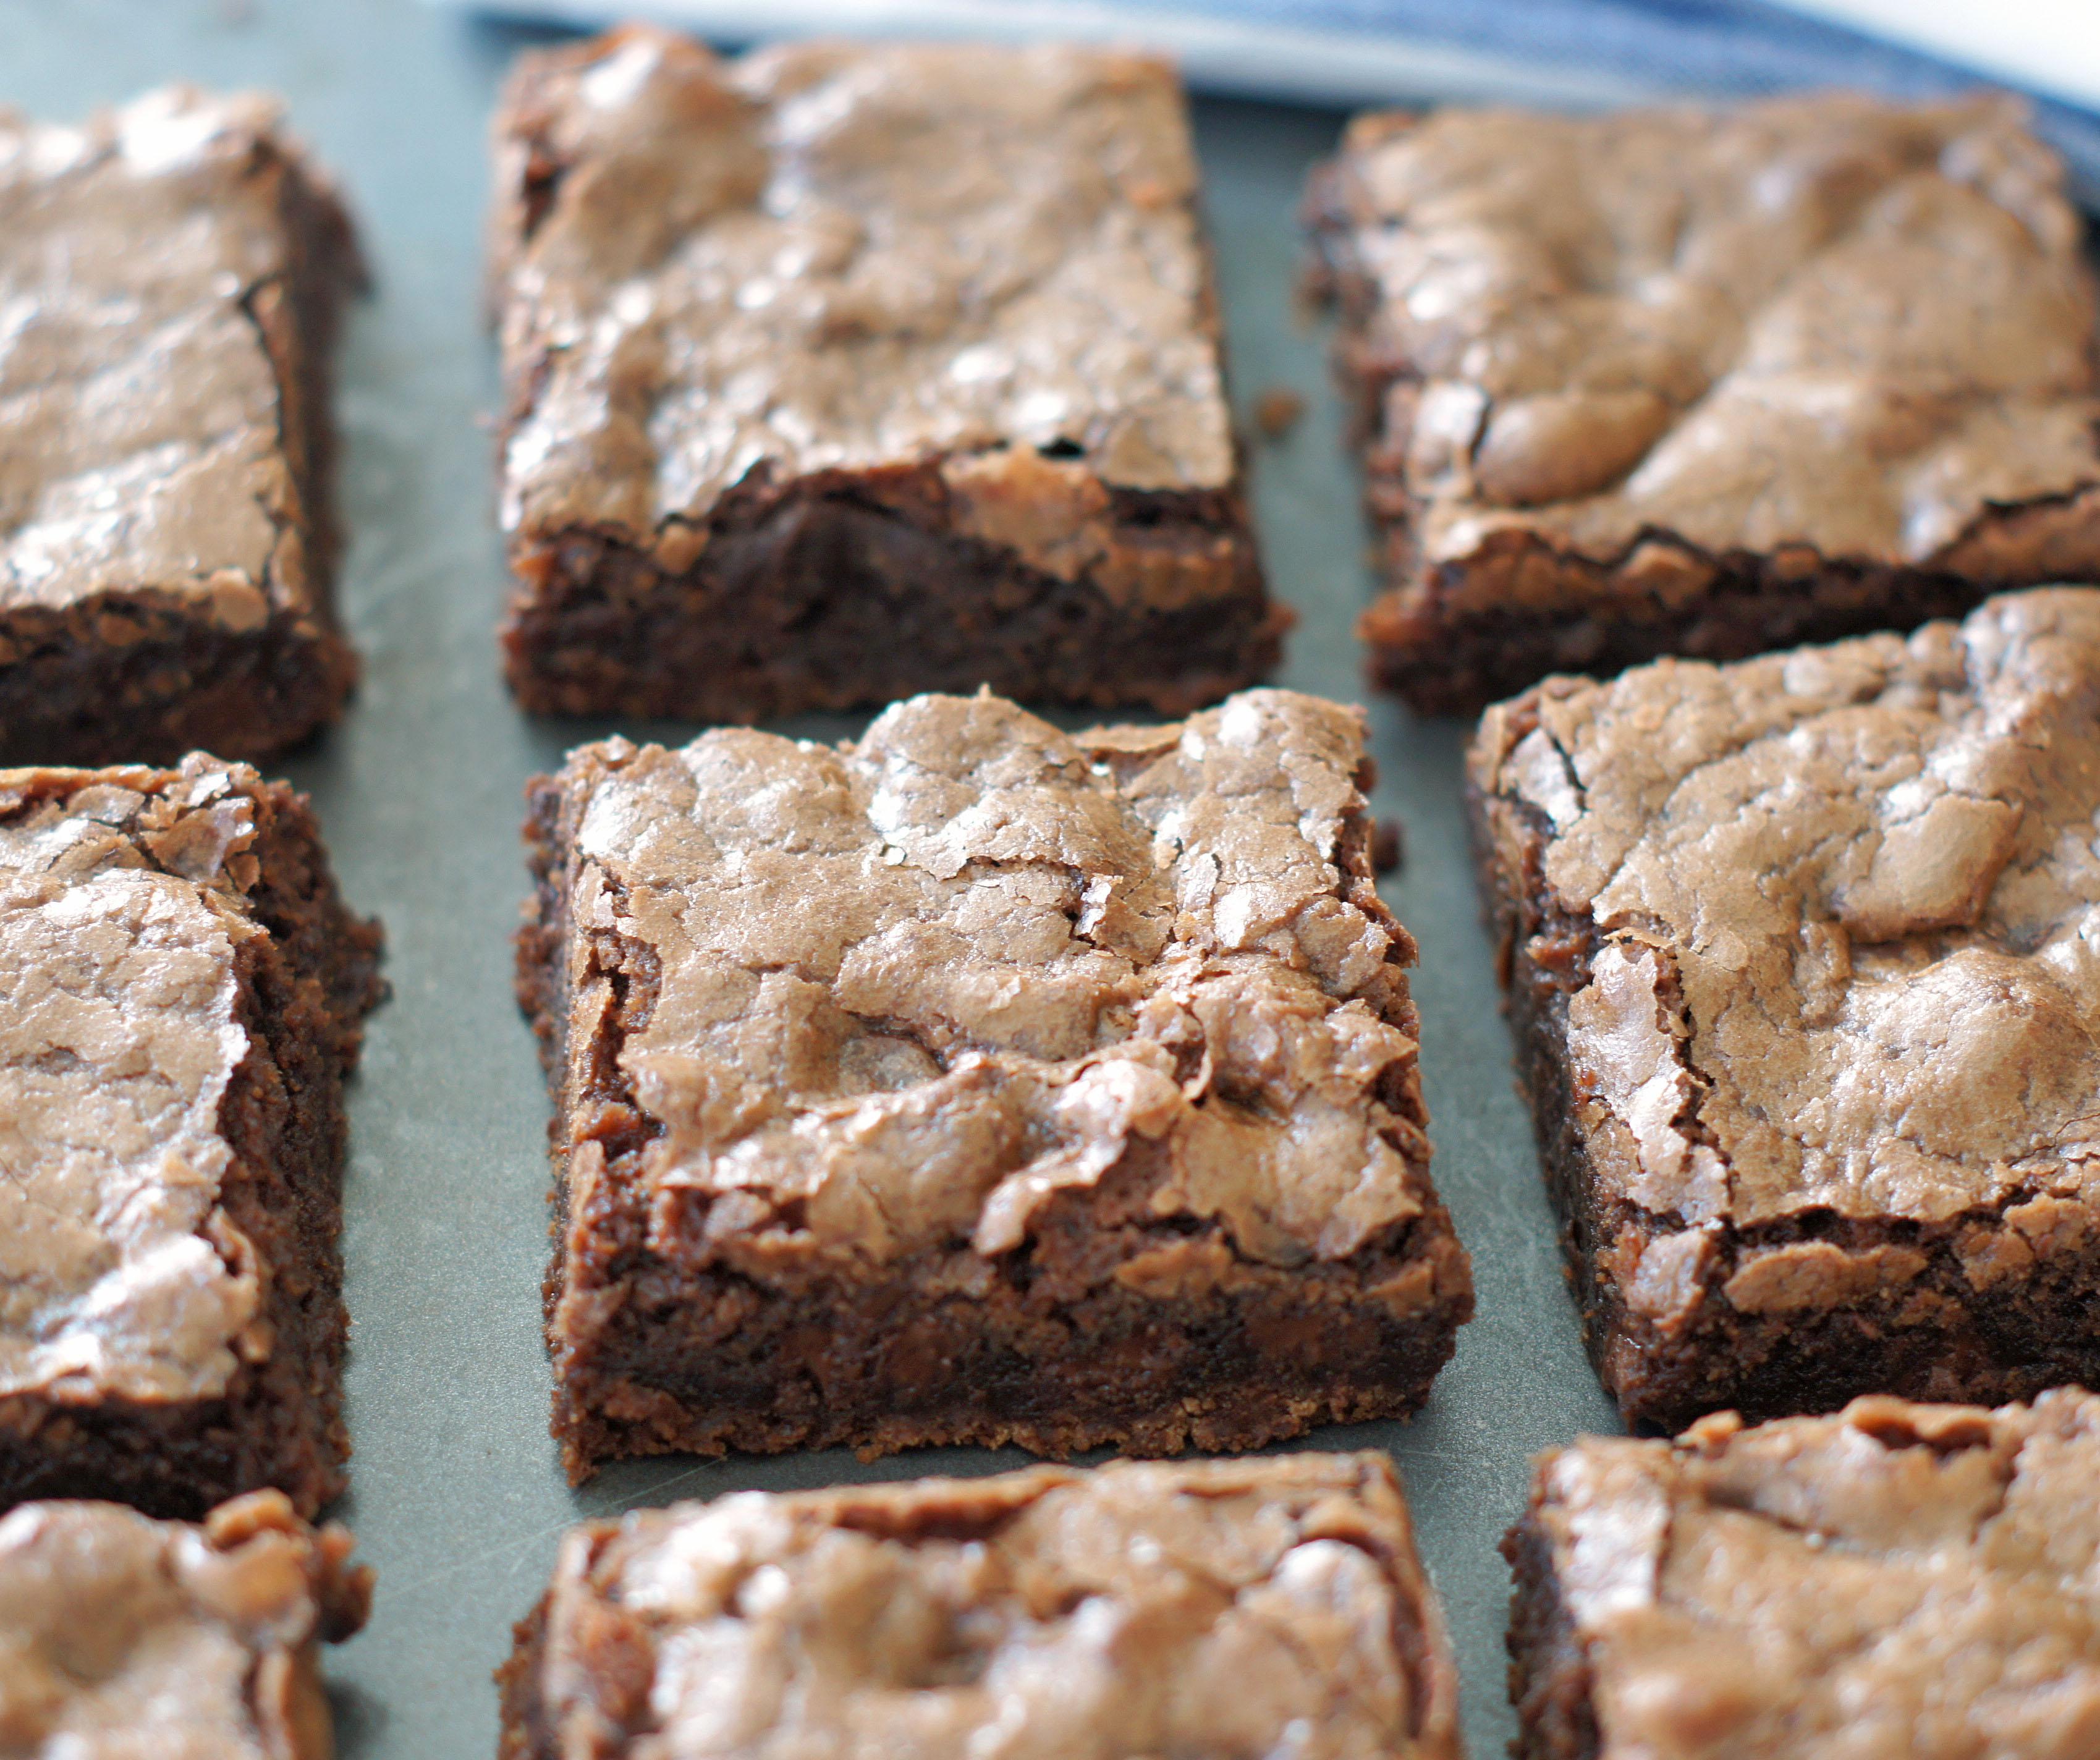 pan of chewy brownies